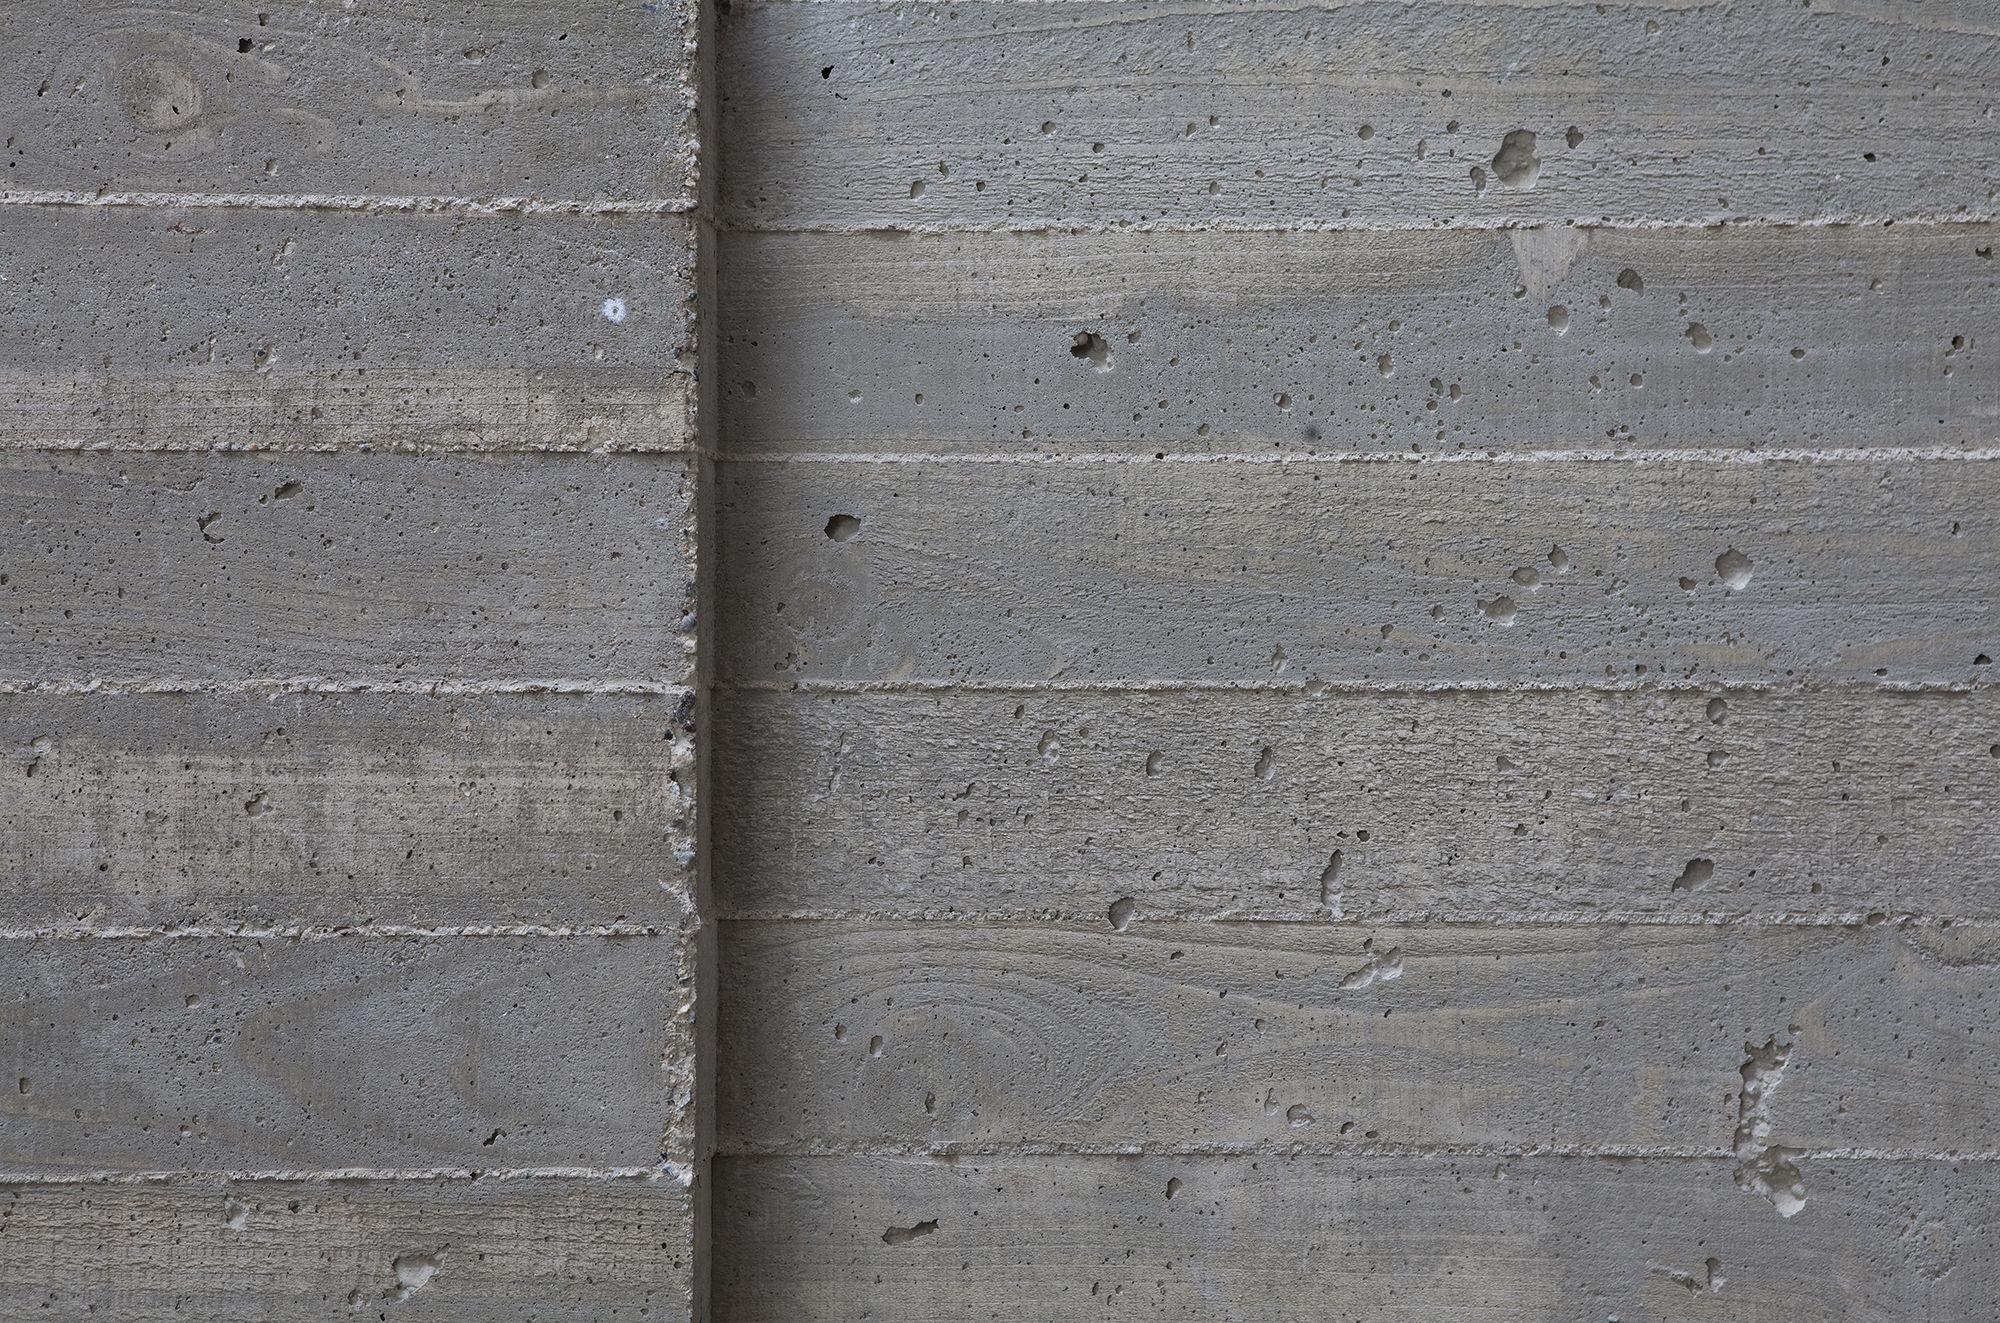 Casting Thin Concrete Wall Concrete Wall Exterior Wall Panels Concrete Wall Panels